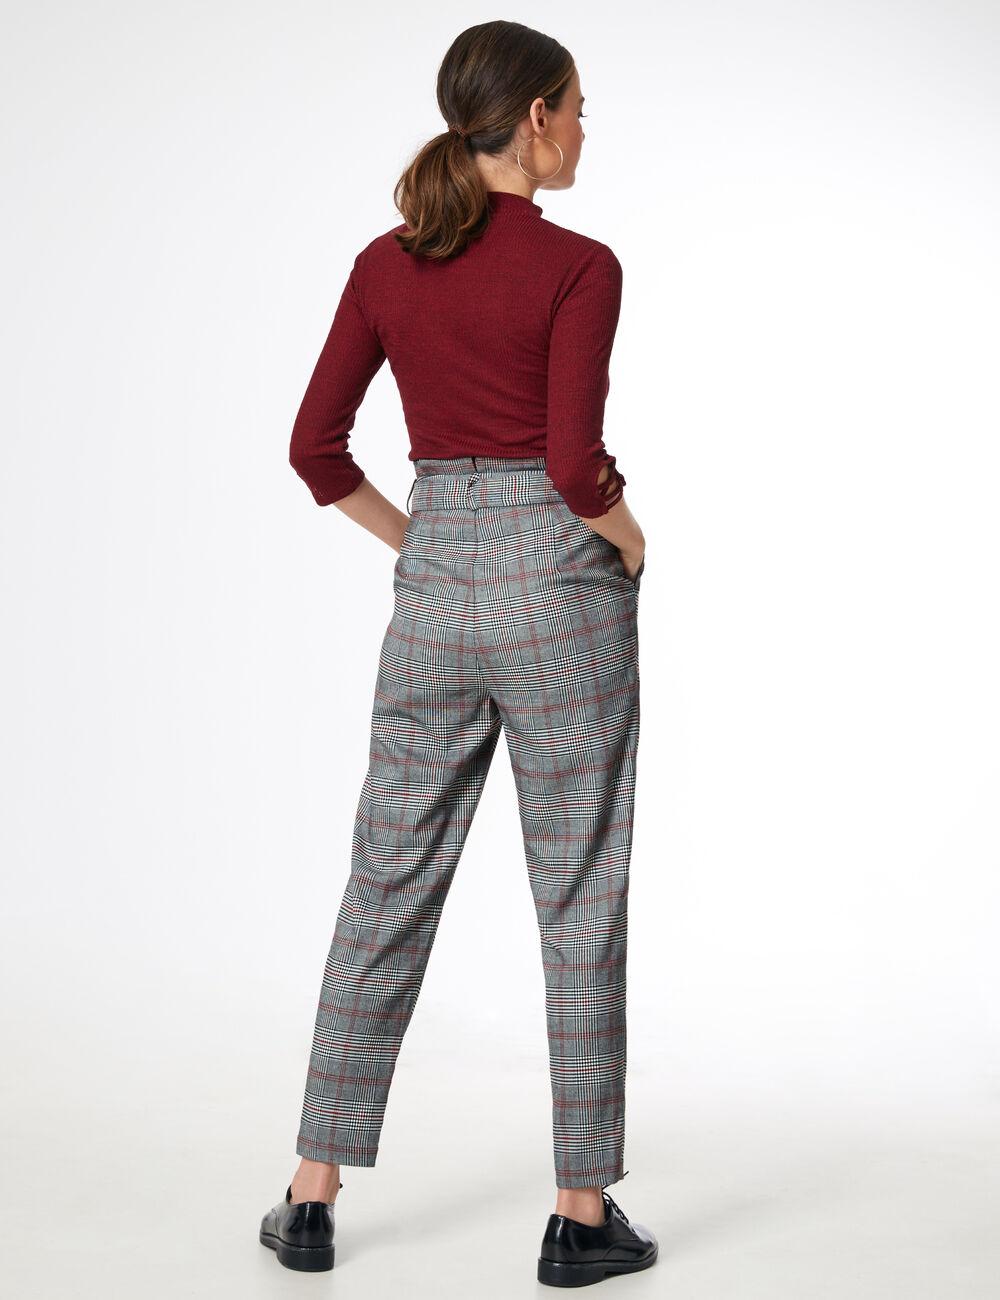 pantalon ville avec ceinture femme jennyfer. Black Bedroom Furniture Sets. Home Design Ideas